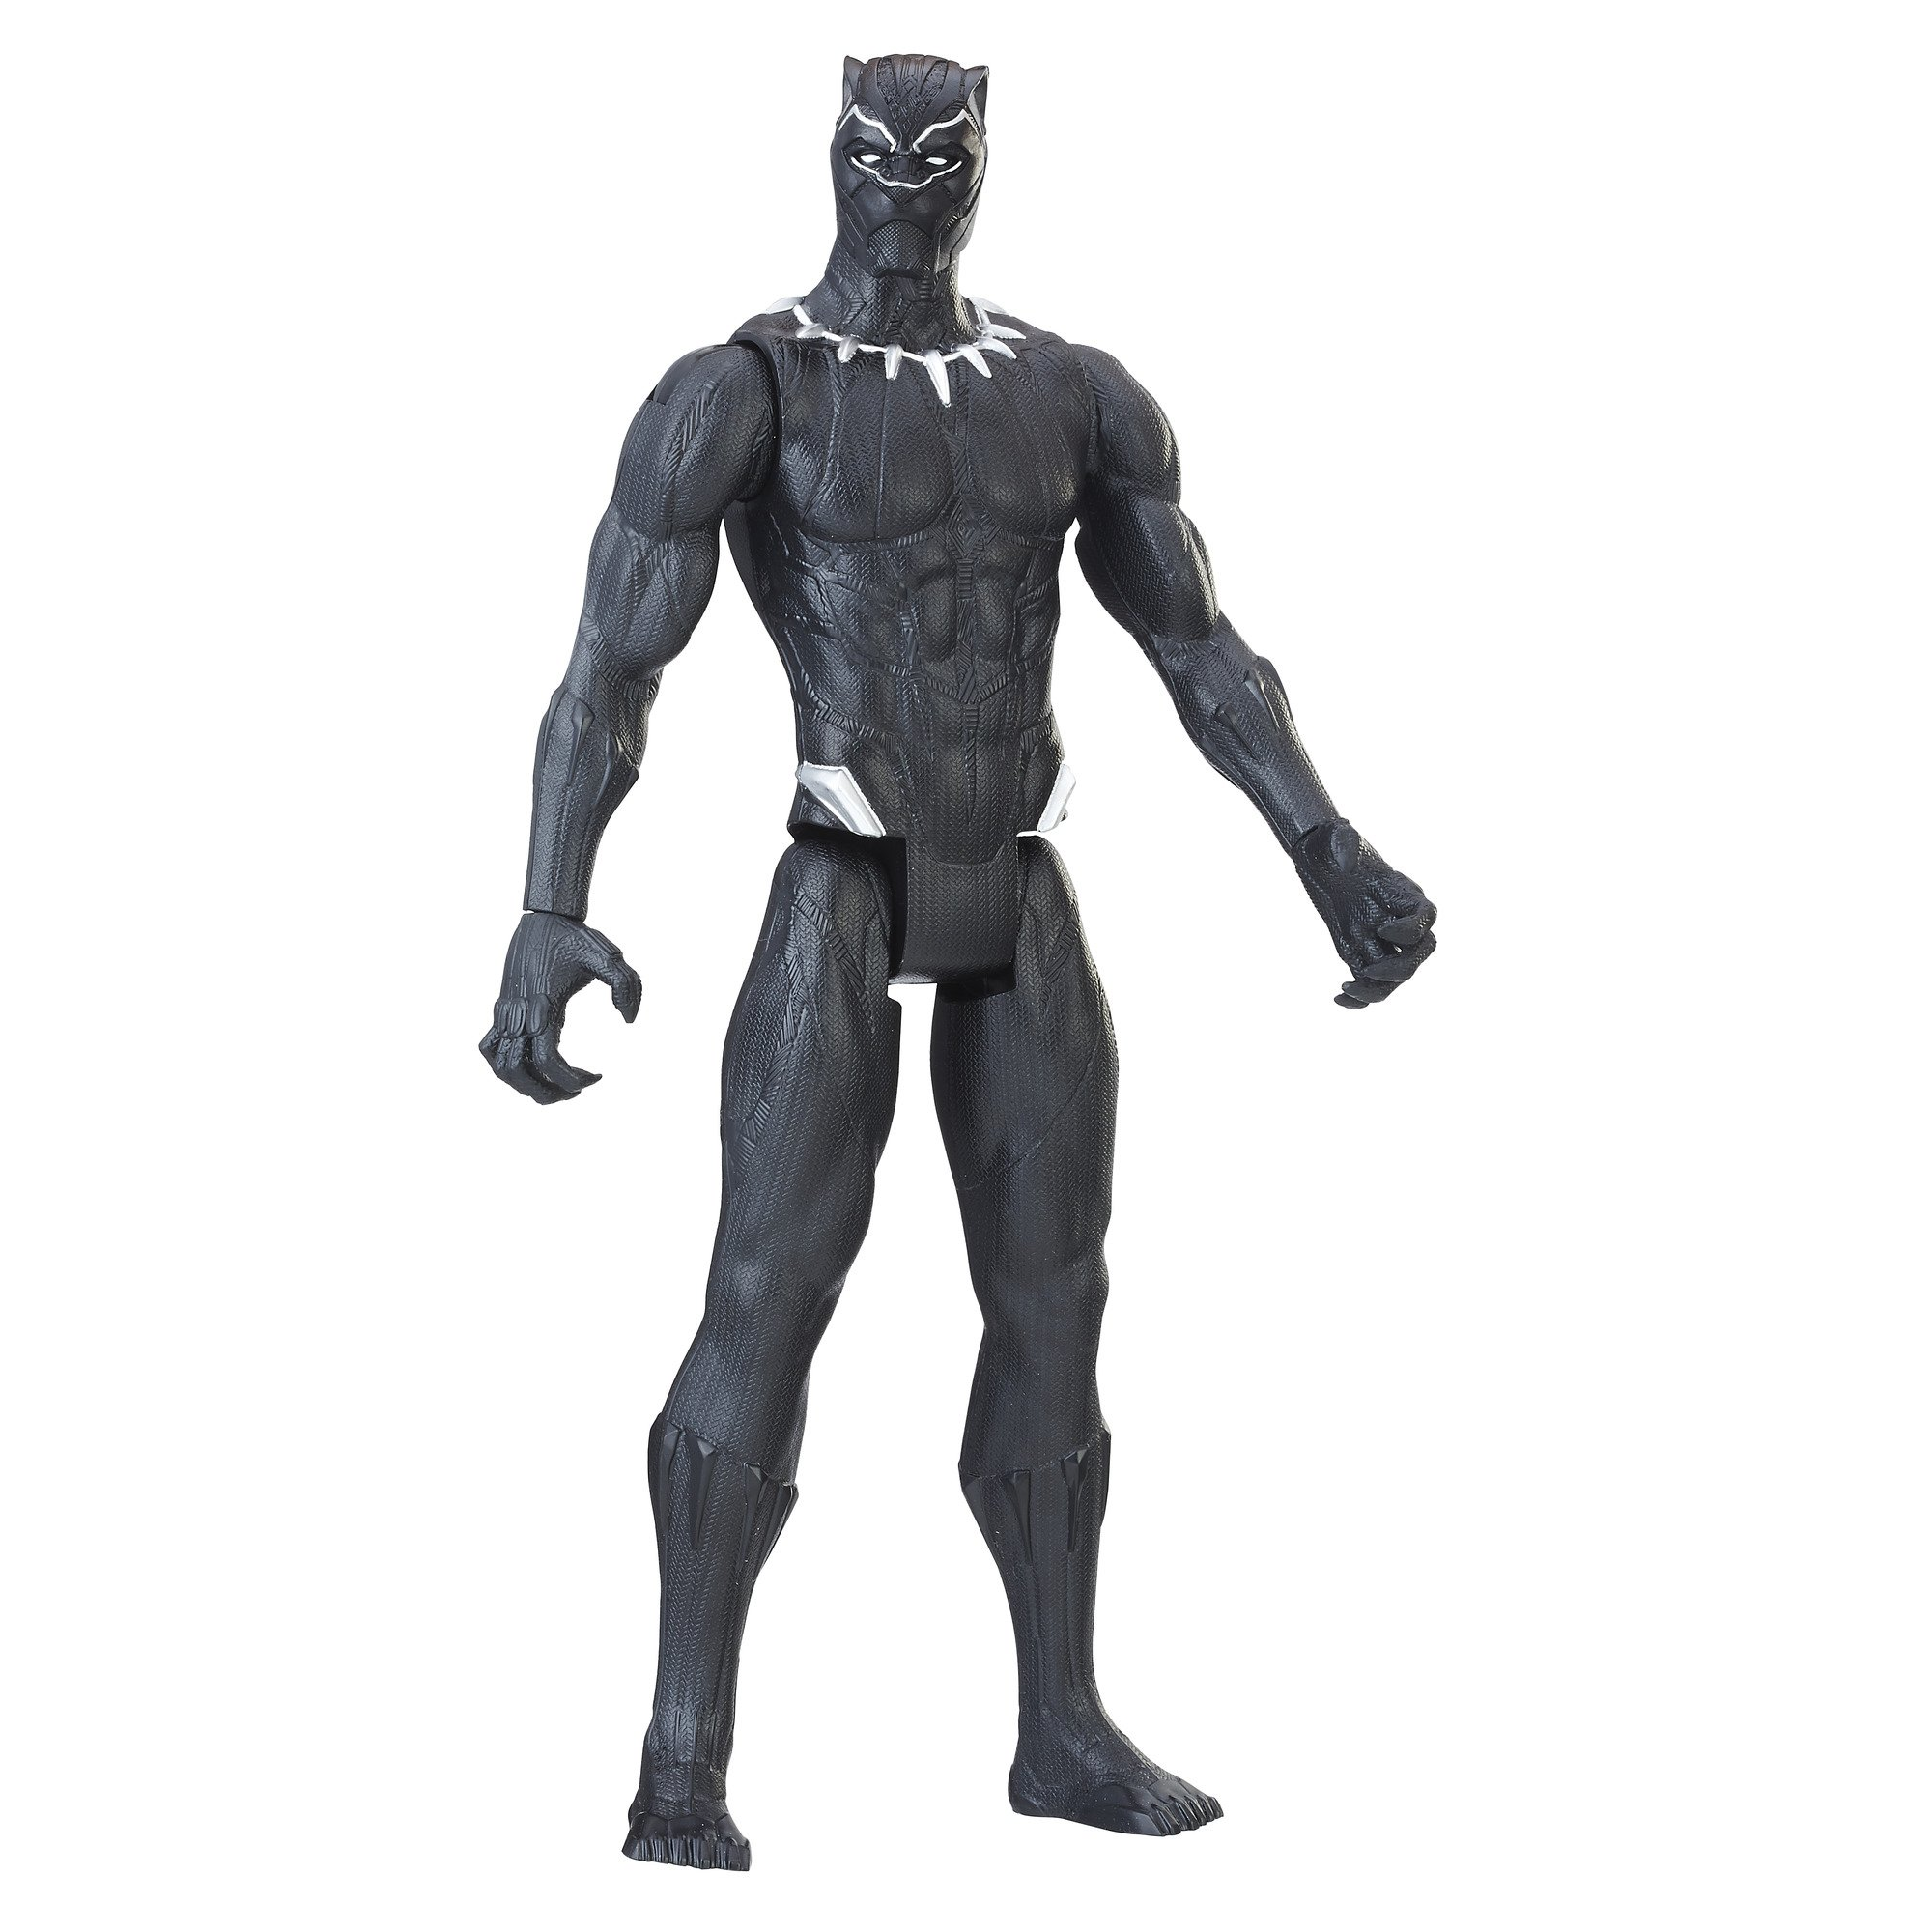 Marvel Black Panther Titan Hero Series 12-inch Black Panther by Marvel (Image #1)